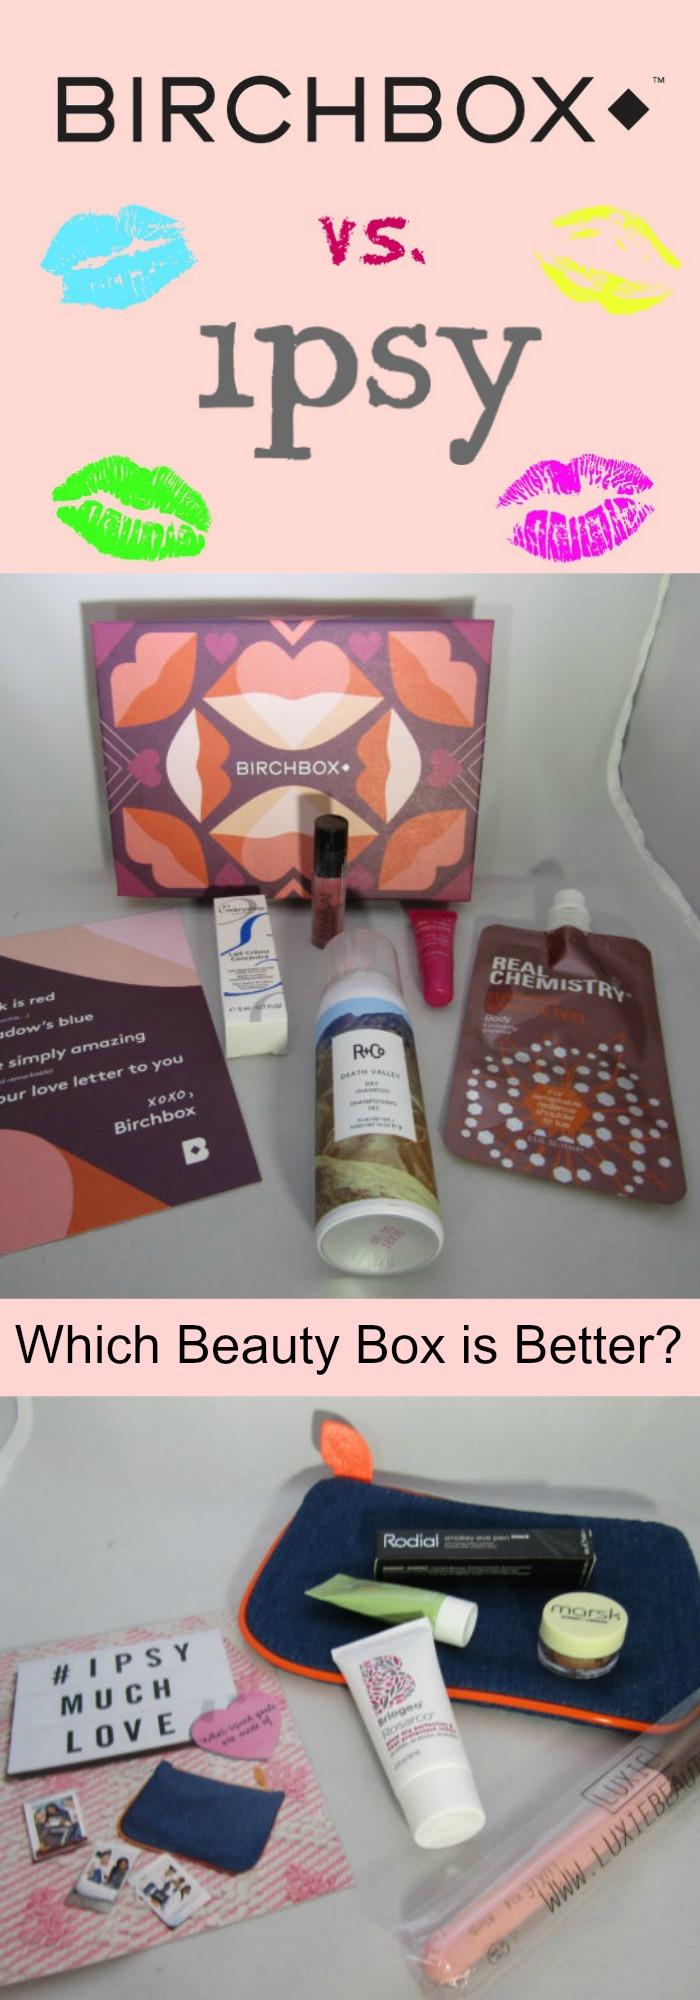 Ipsy Vs. Birchbox Beauty Box: Which Is Better?